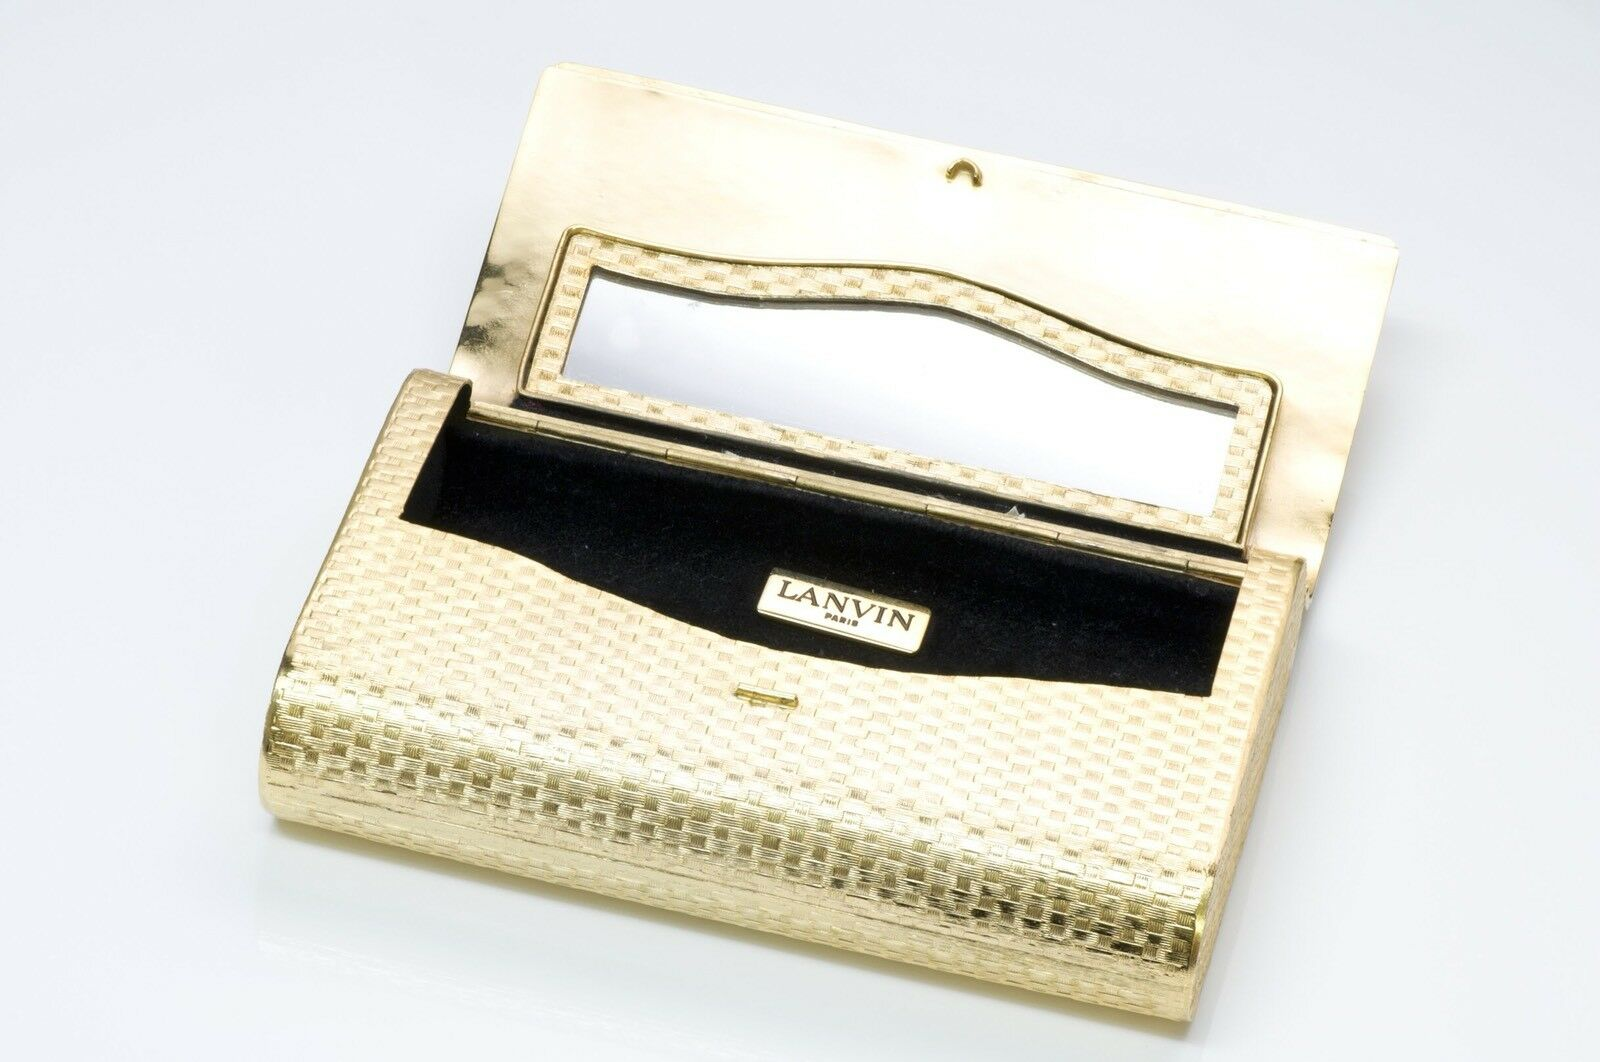 Lanvin 1970's Gold Tone Metal Clutch - image 4